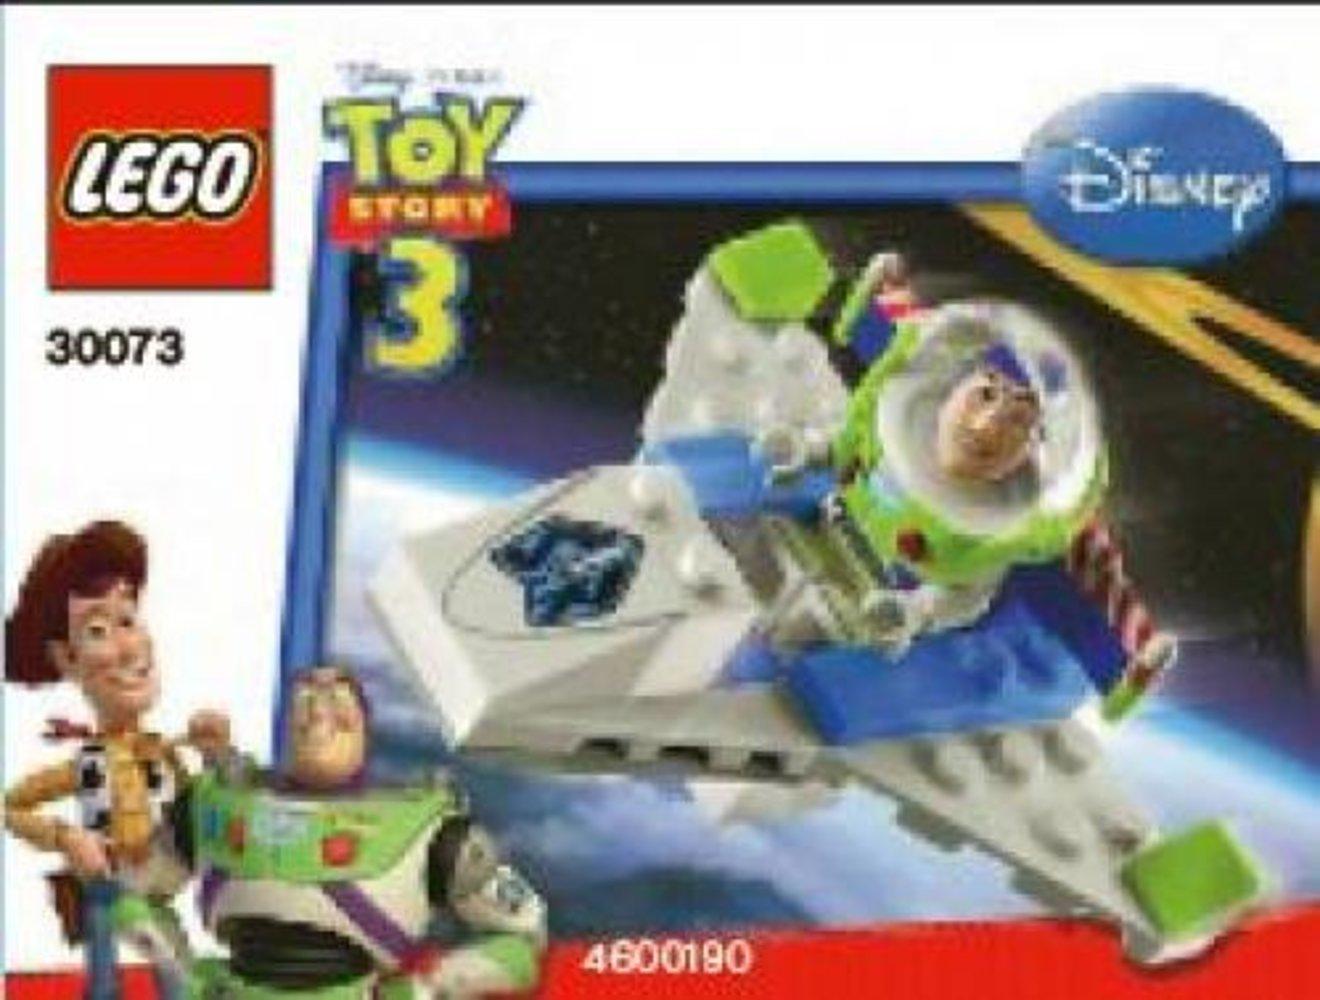 Buzz's Mini Ship